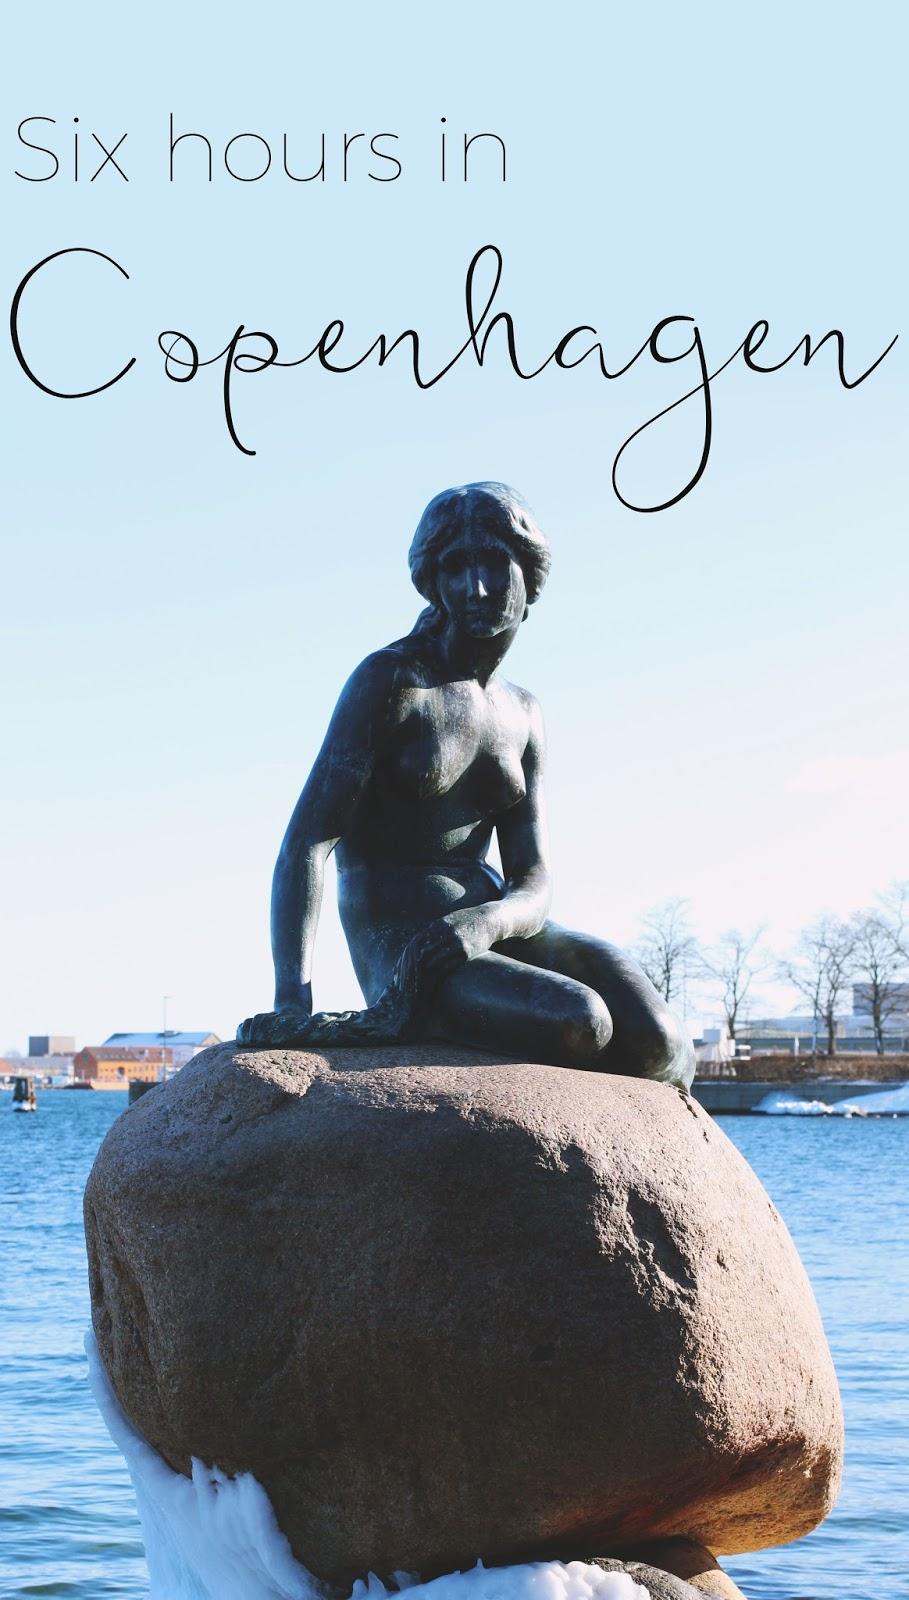 Copenhagen day trip